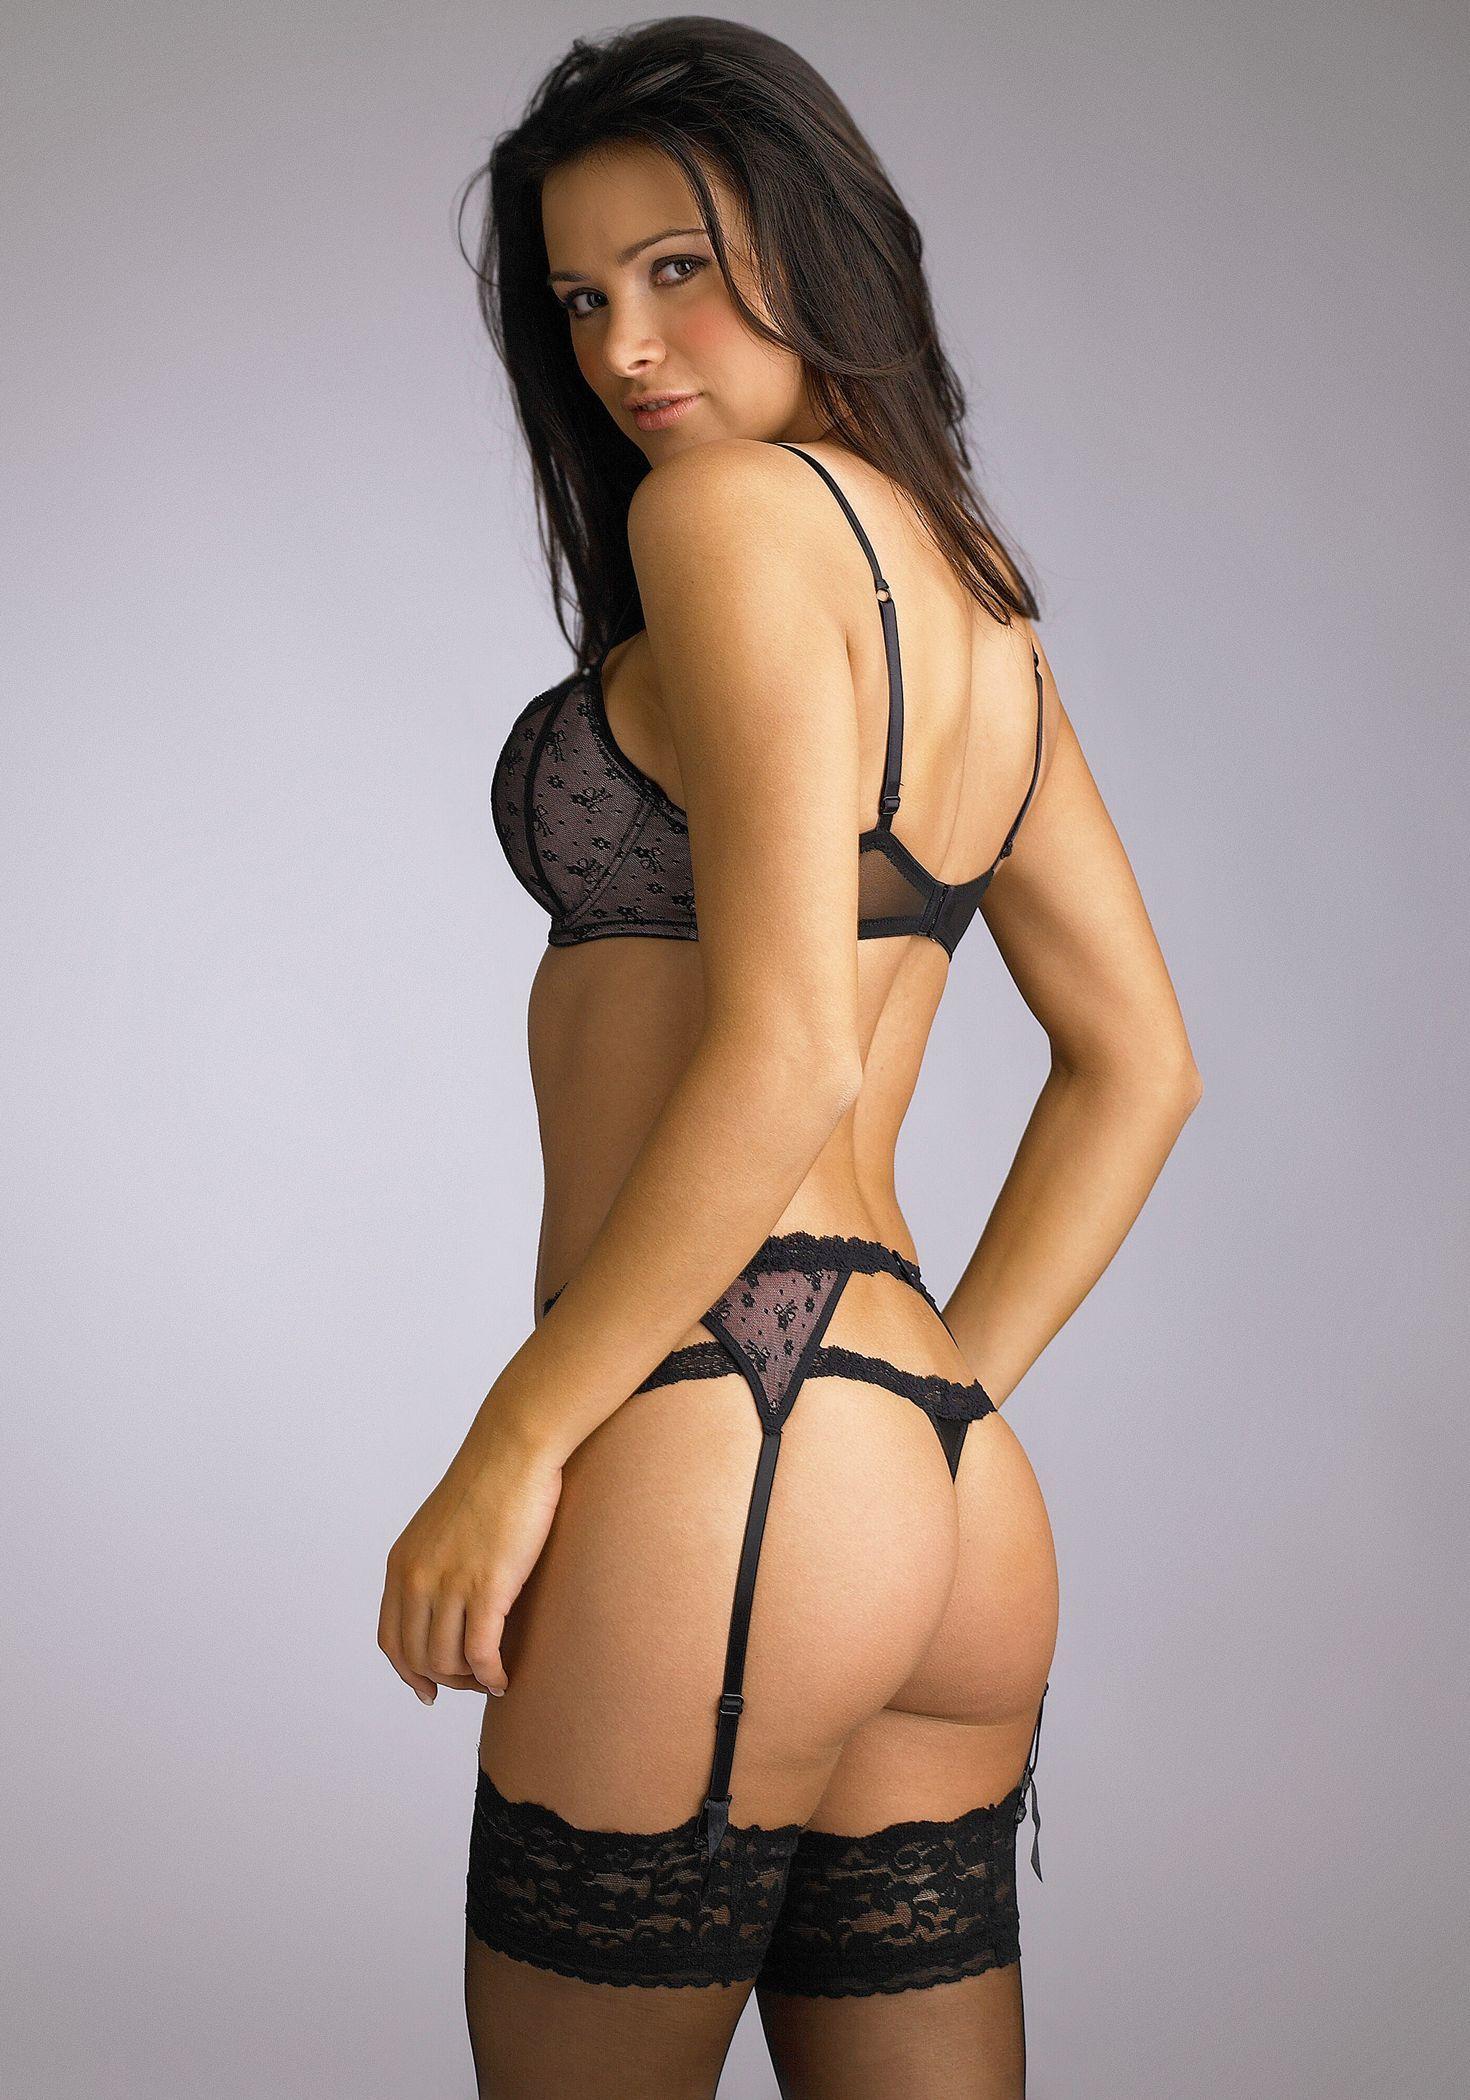 girls_alina_vacariu_black_lingerie | LINGERIE | Pinterest